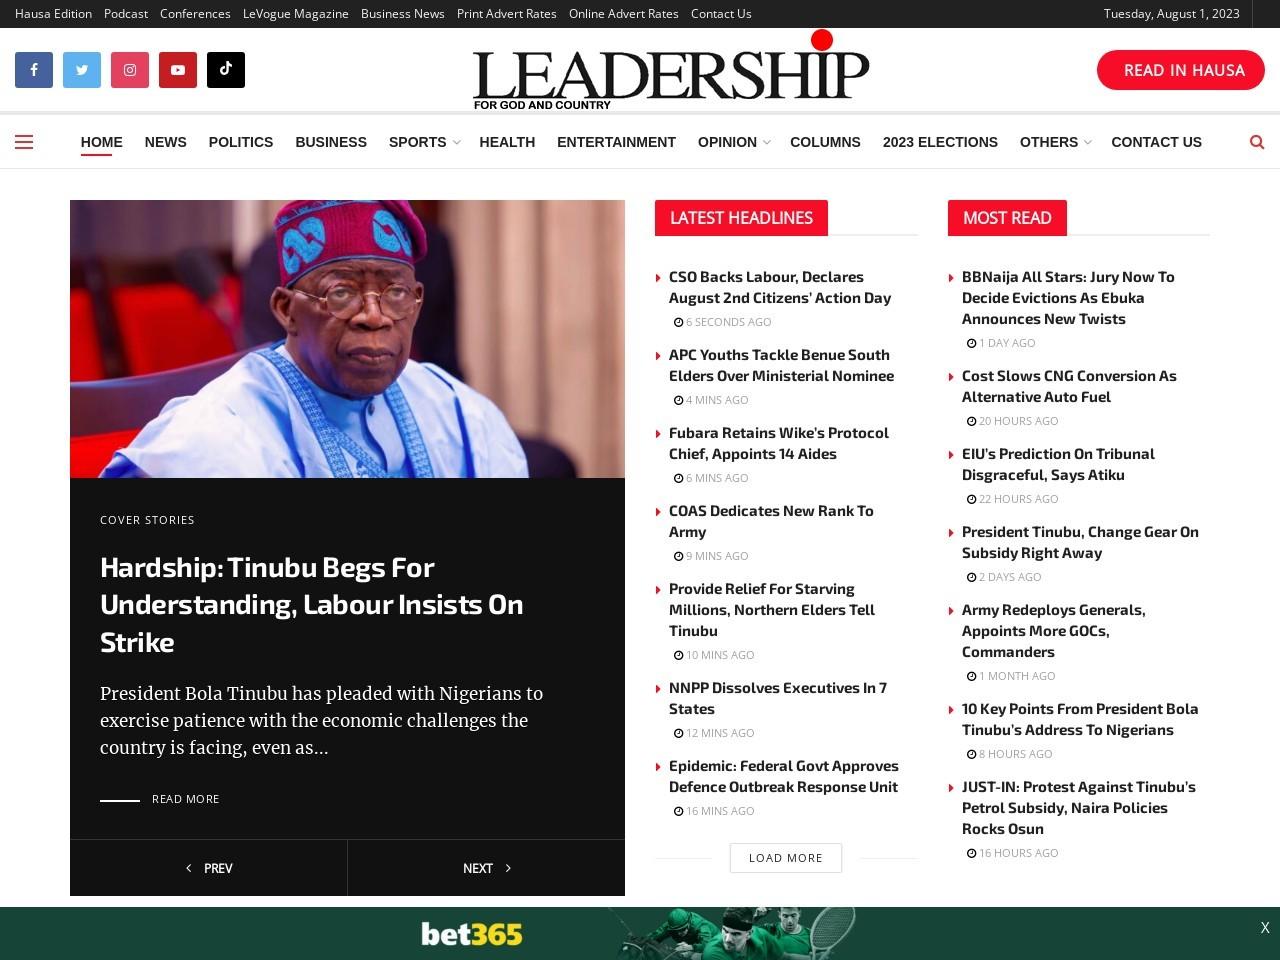 Saraki, Others Qualified To Be President – Ajulo